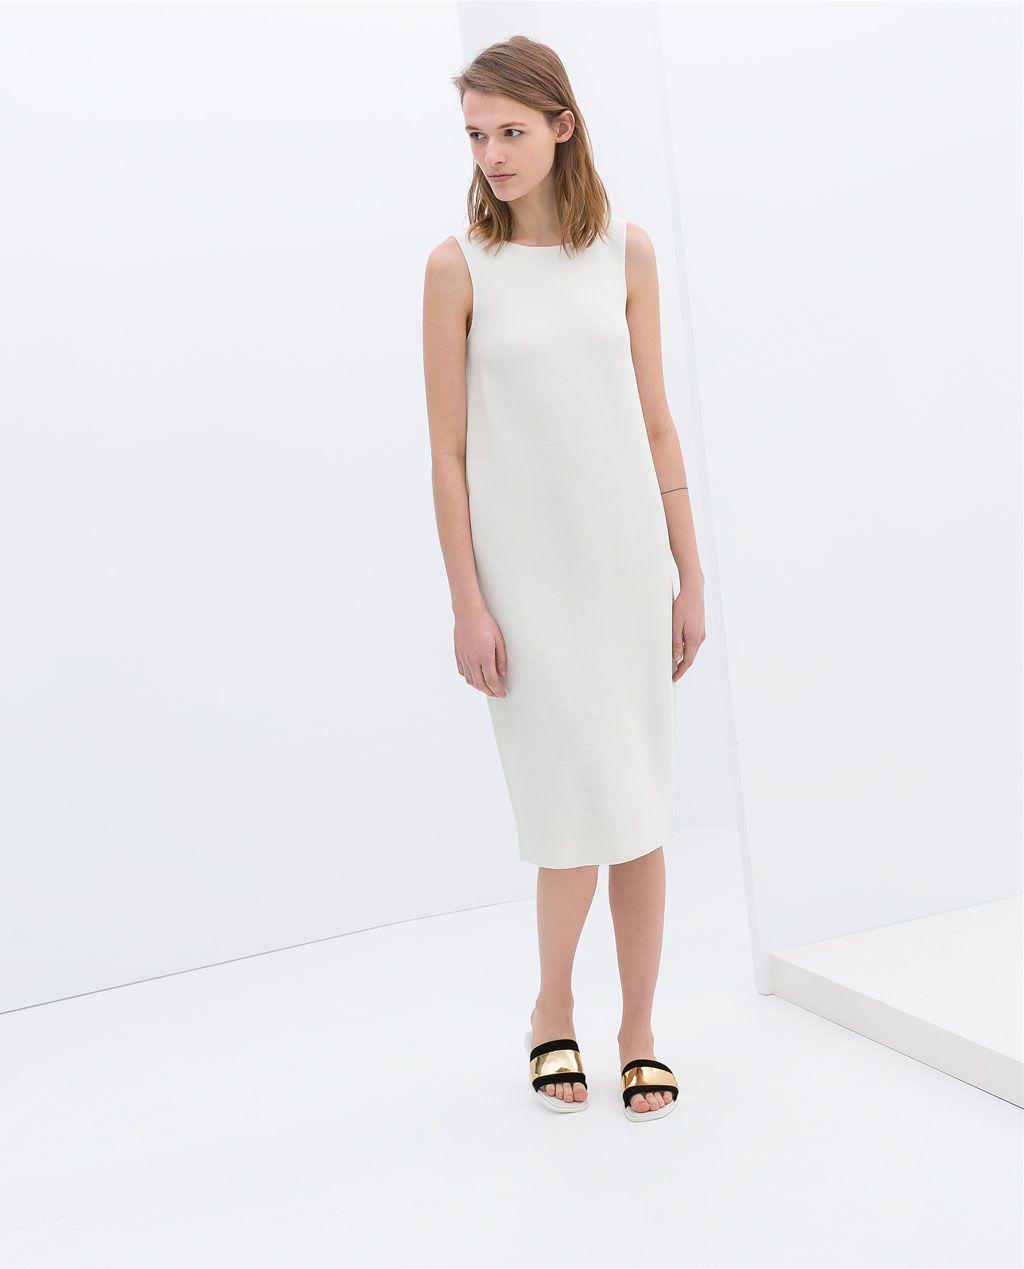 7761addb924e52 Image 1 of SLEEVELESS SHIFT DRESS from Zara Summer Work Dresses